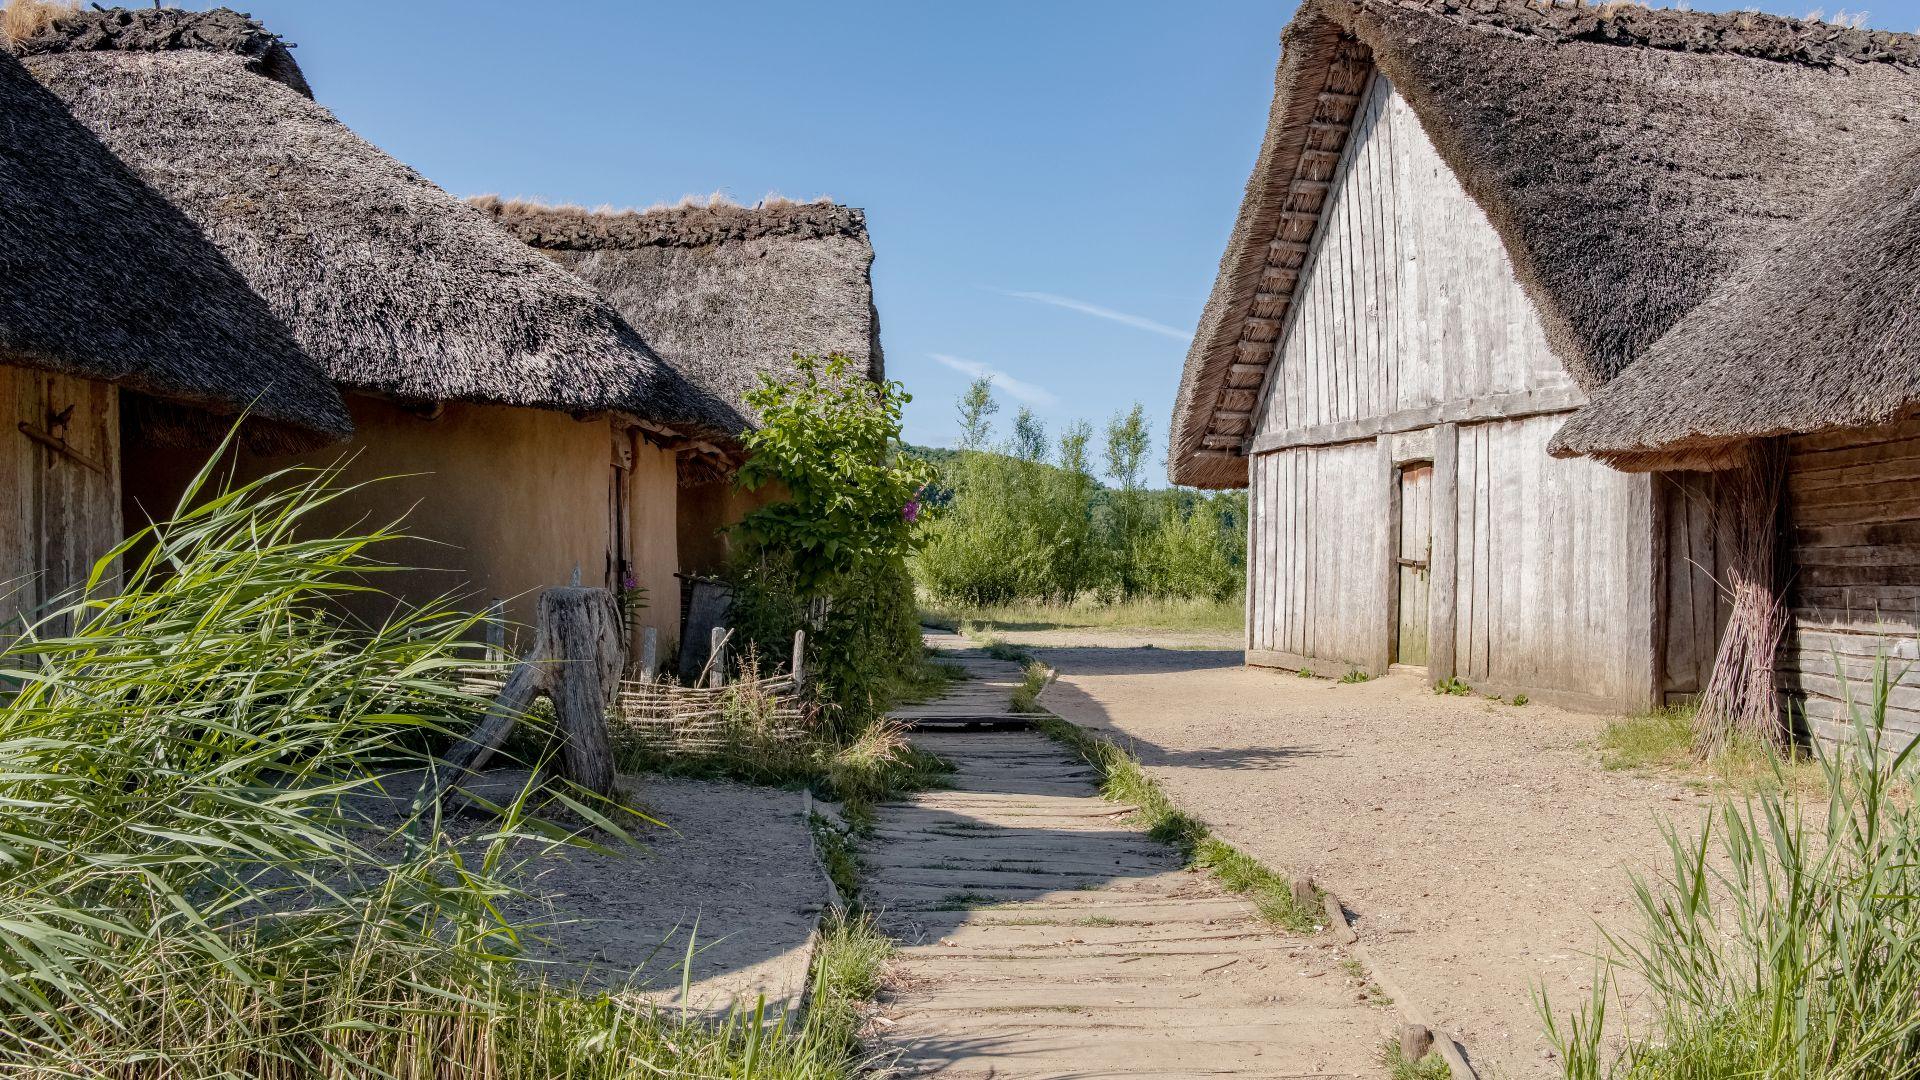 Busdorf: UNESCO Haithabu, colony of vikings